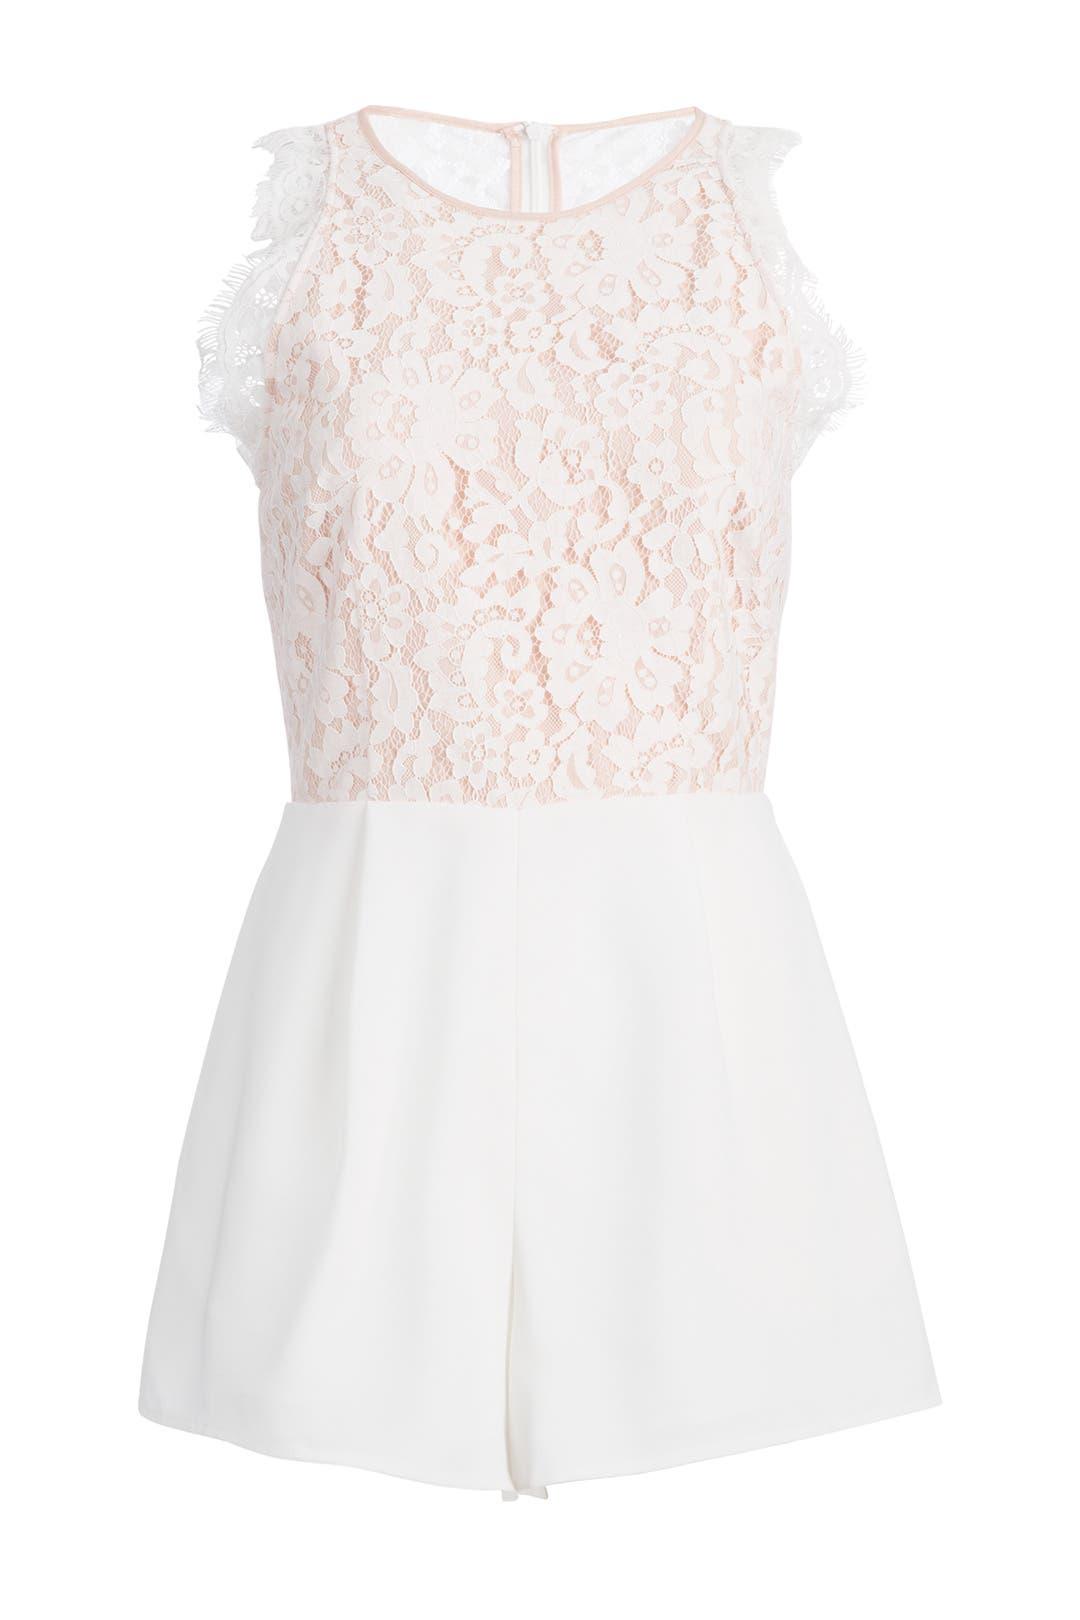 Silver pearl marisol white lace 1 - Keepsake White Lily Romper